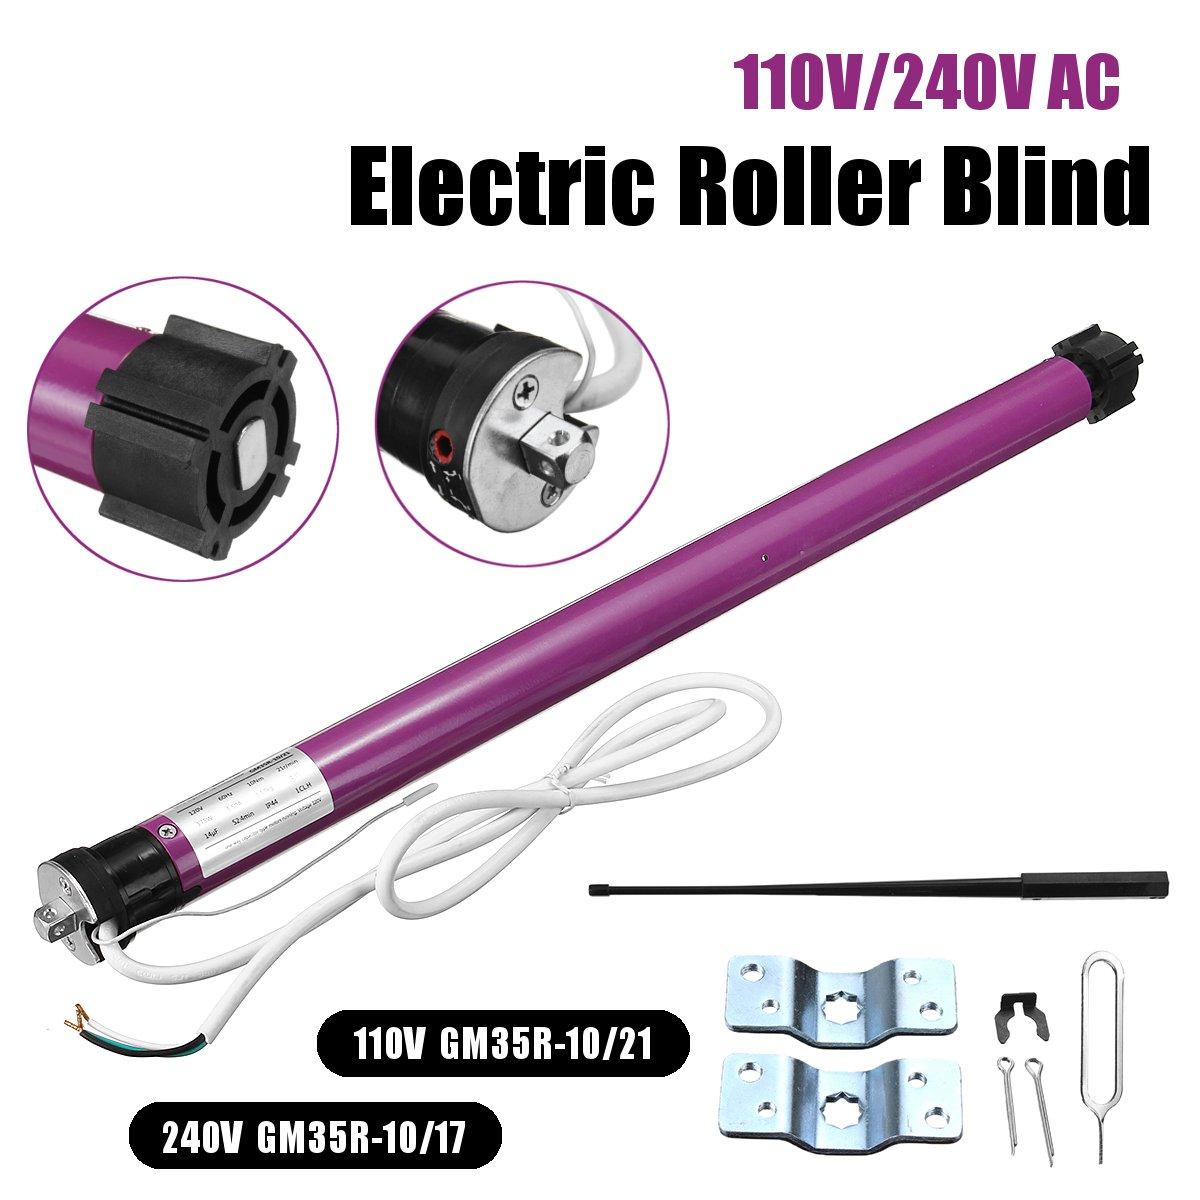 110V/240V 60cm Roller Shade Motor Tubular Electric Curtains Motor Roller Set blind shutters Blind Tubular Motor